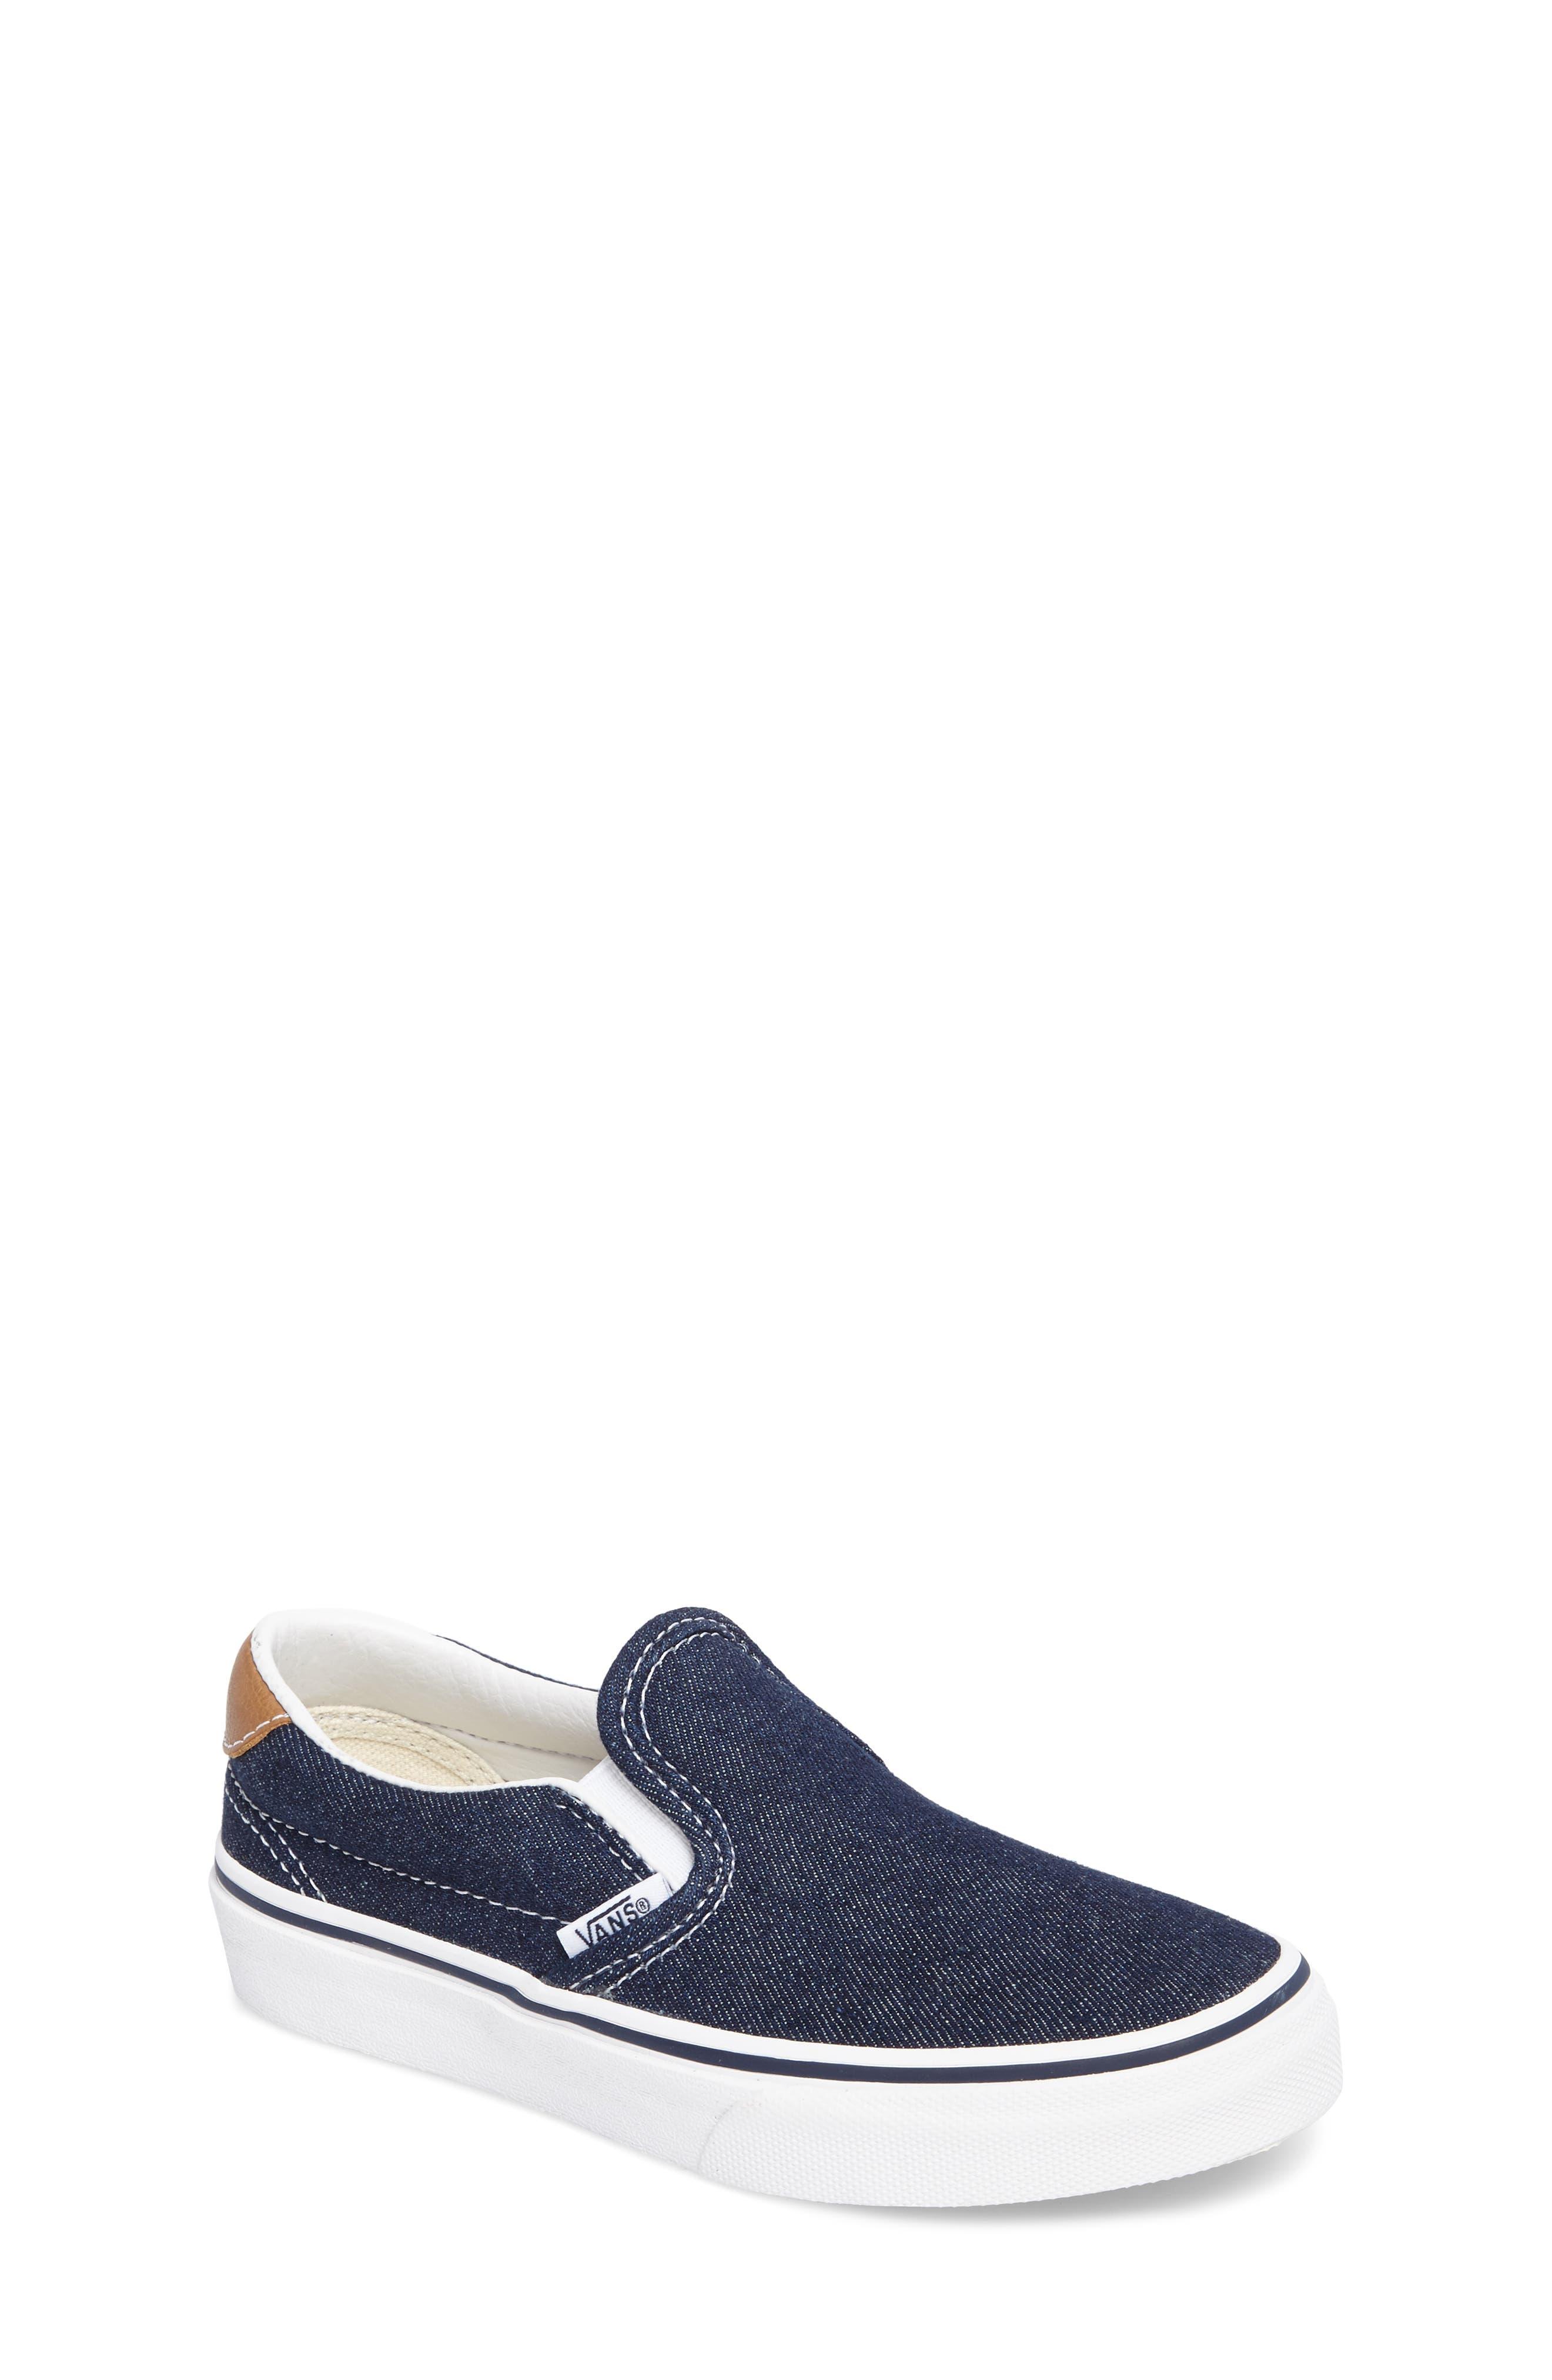 Denim C&L Slip-On 59 Sneaker,                         Main,                         color, Denim Dress Blues/ Chipmunk